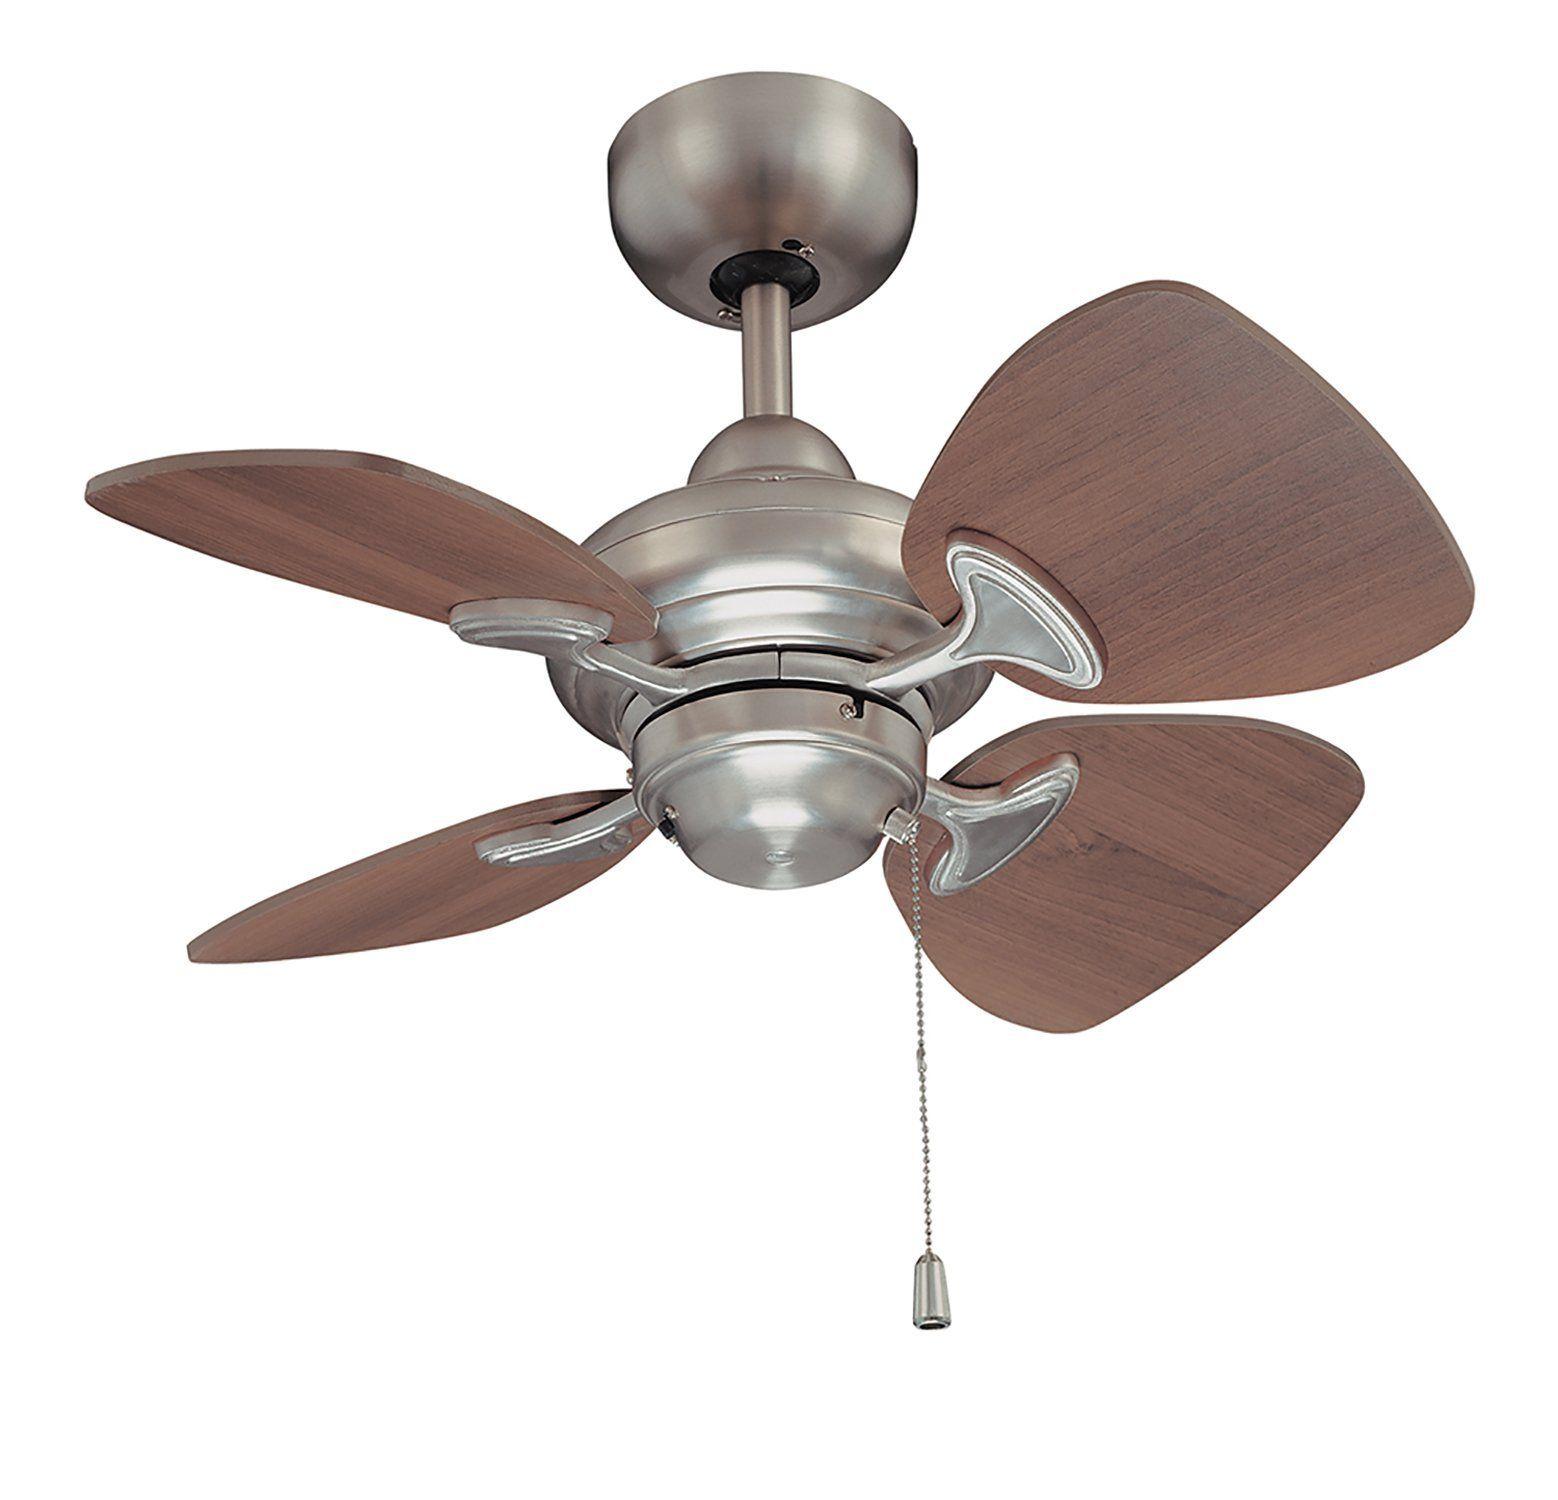 Kendal Lighting Ac16324 Sn 24 Inch 4 Blade In 2020 Ceiling Fan Ceiling Fan With Light Fan Light